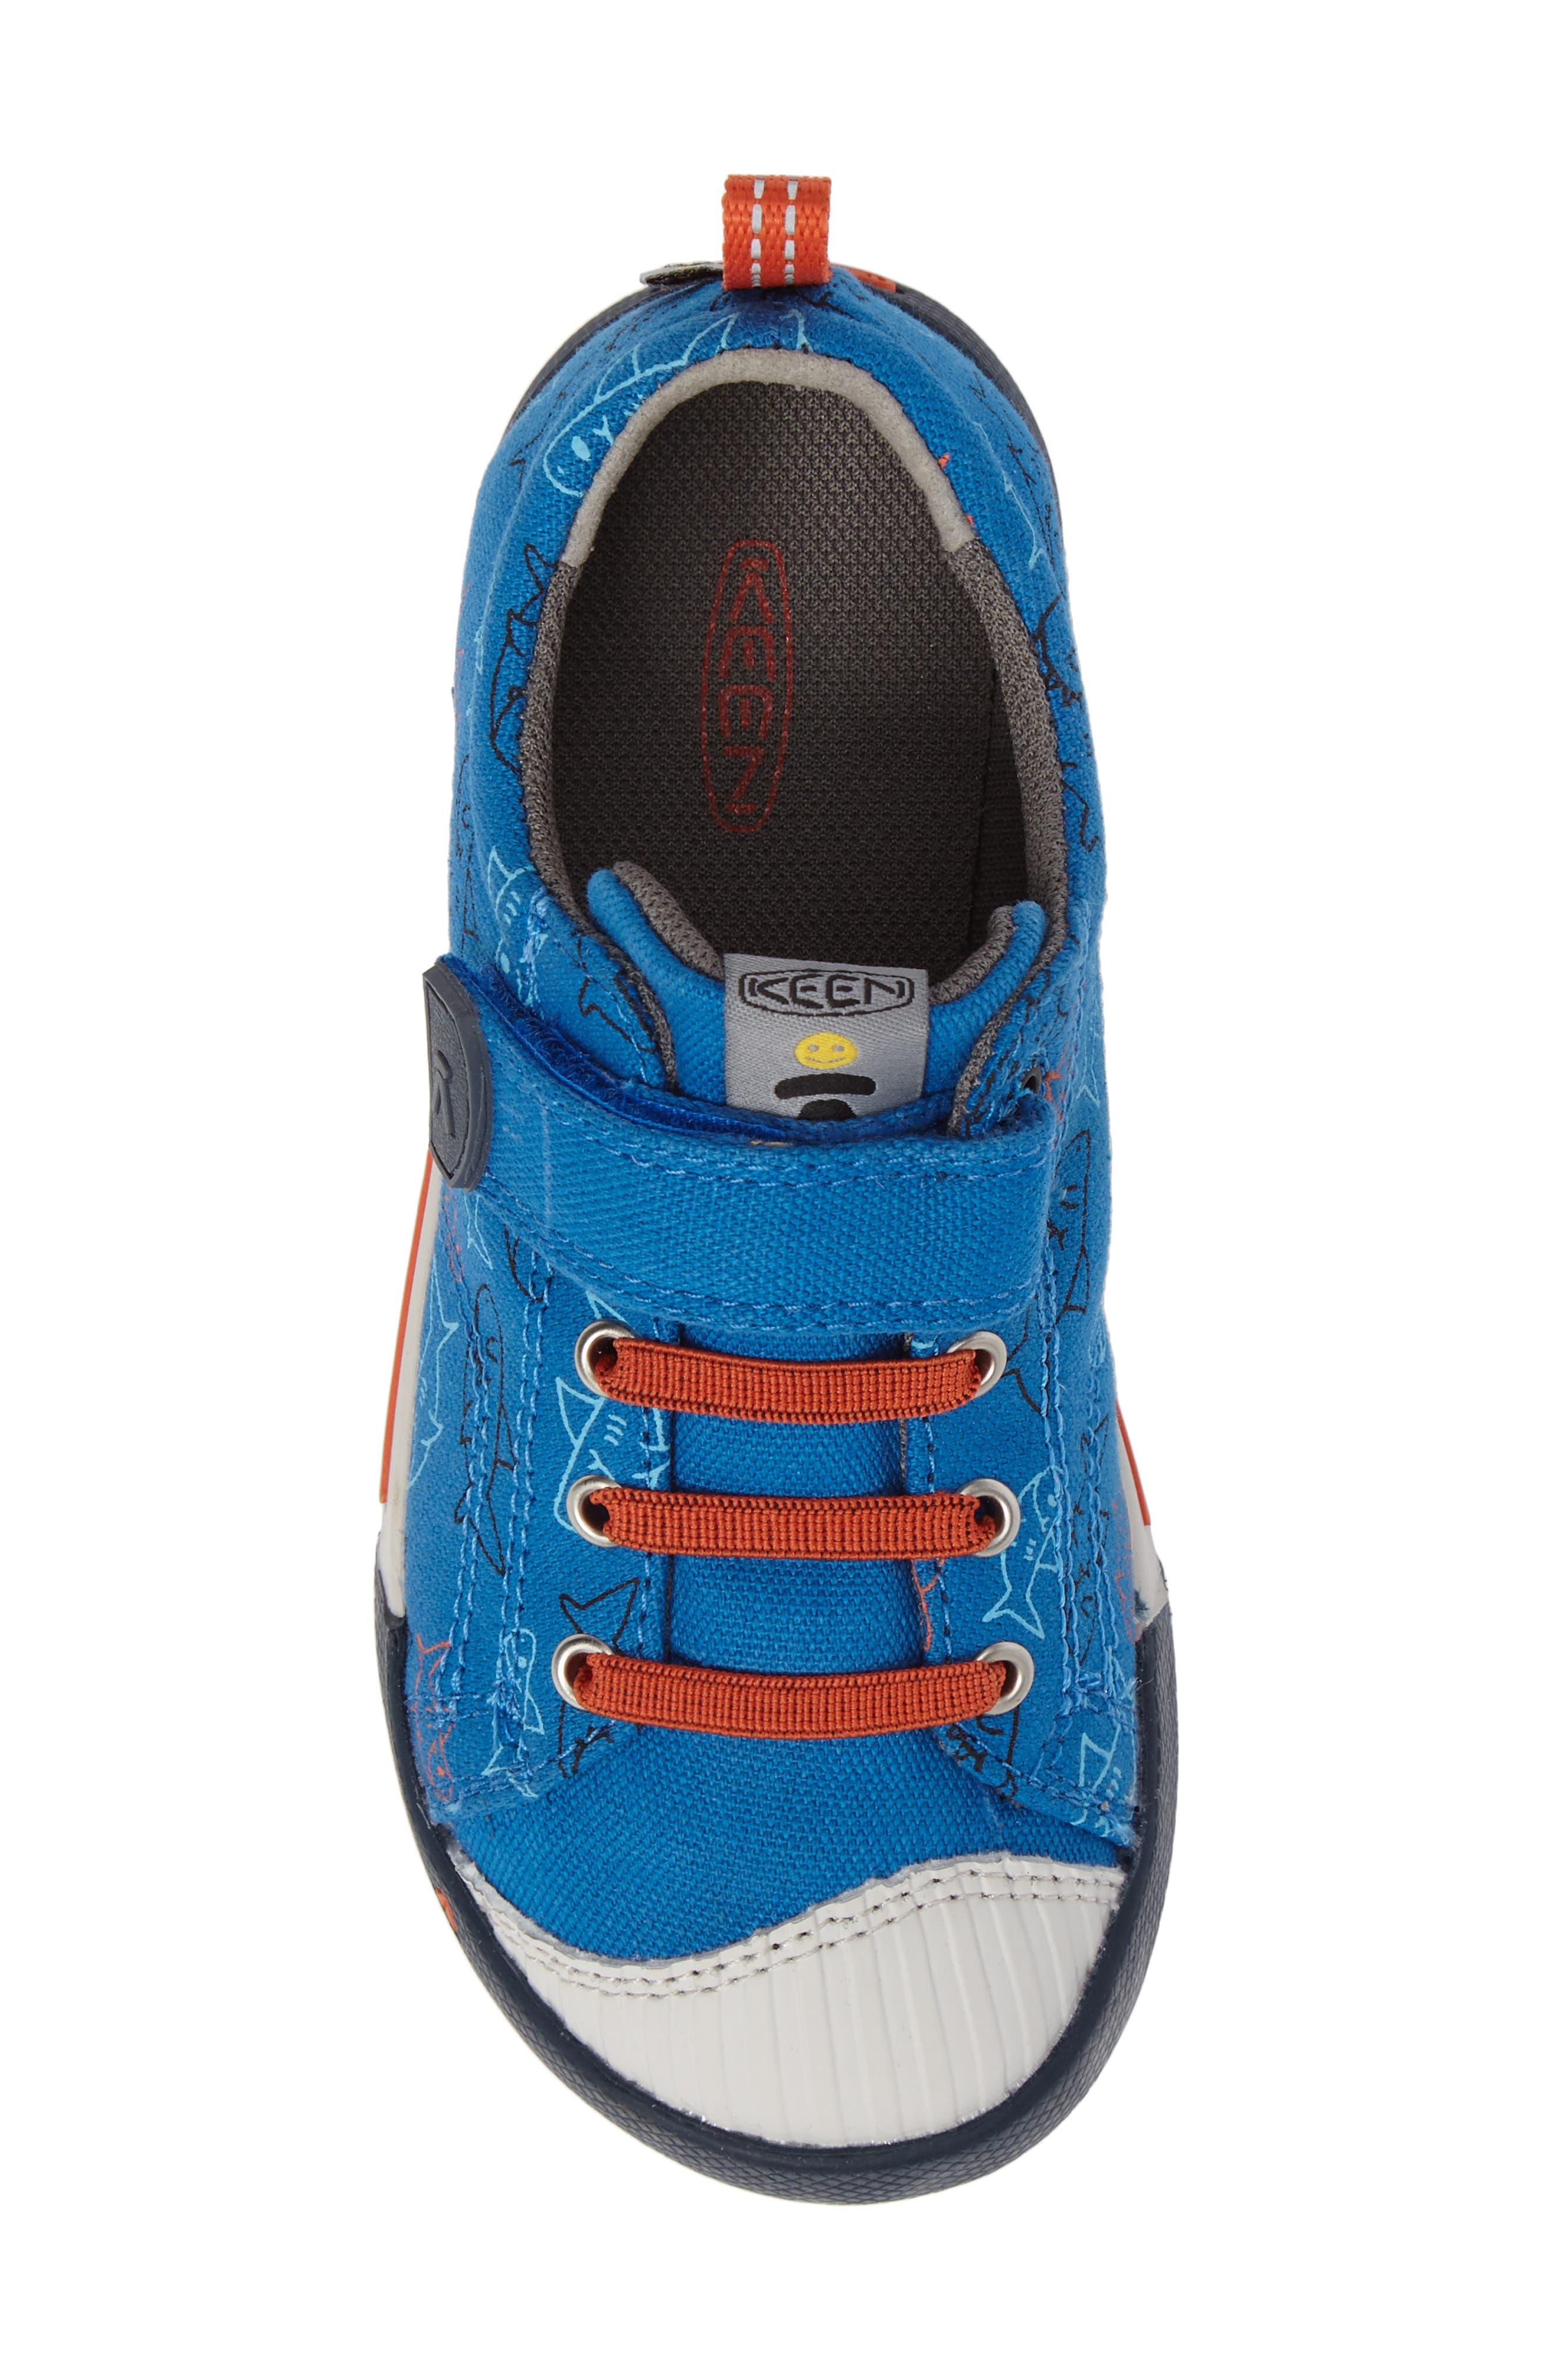 Encanto Finley Sneaker,                             Alternate thumbnail 5, color,                             402